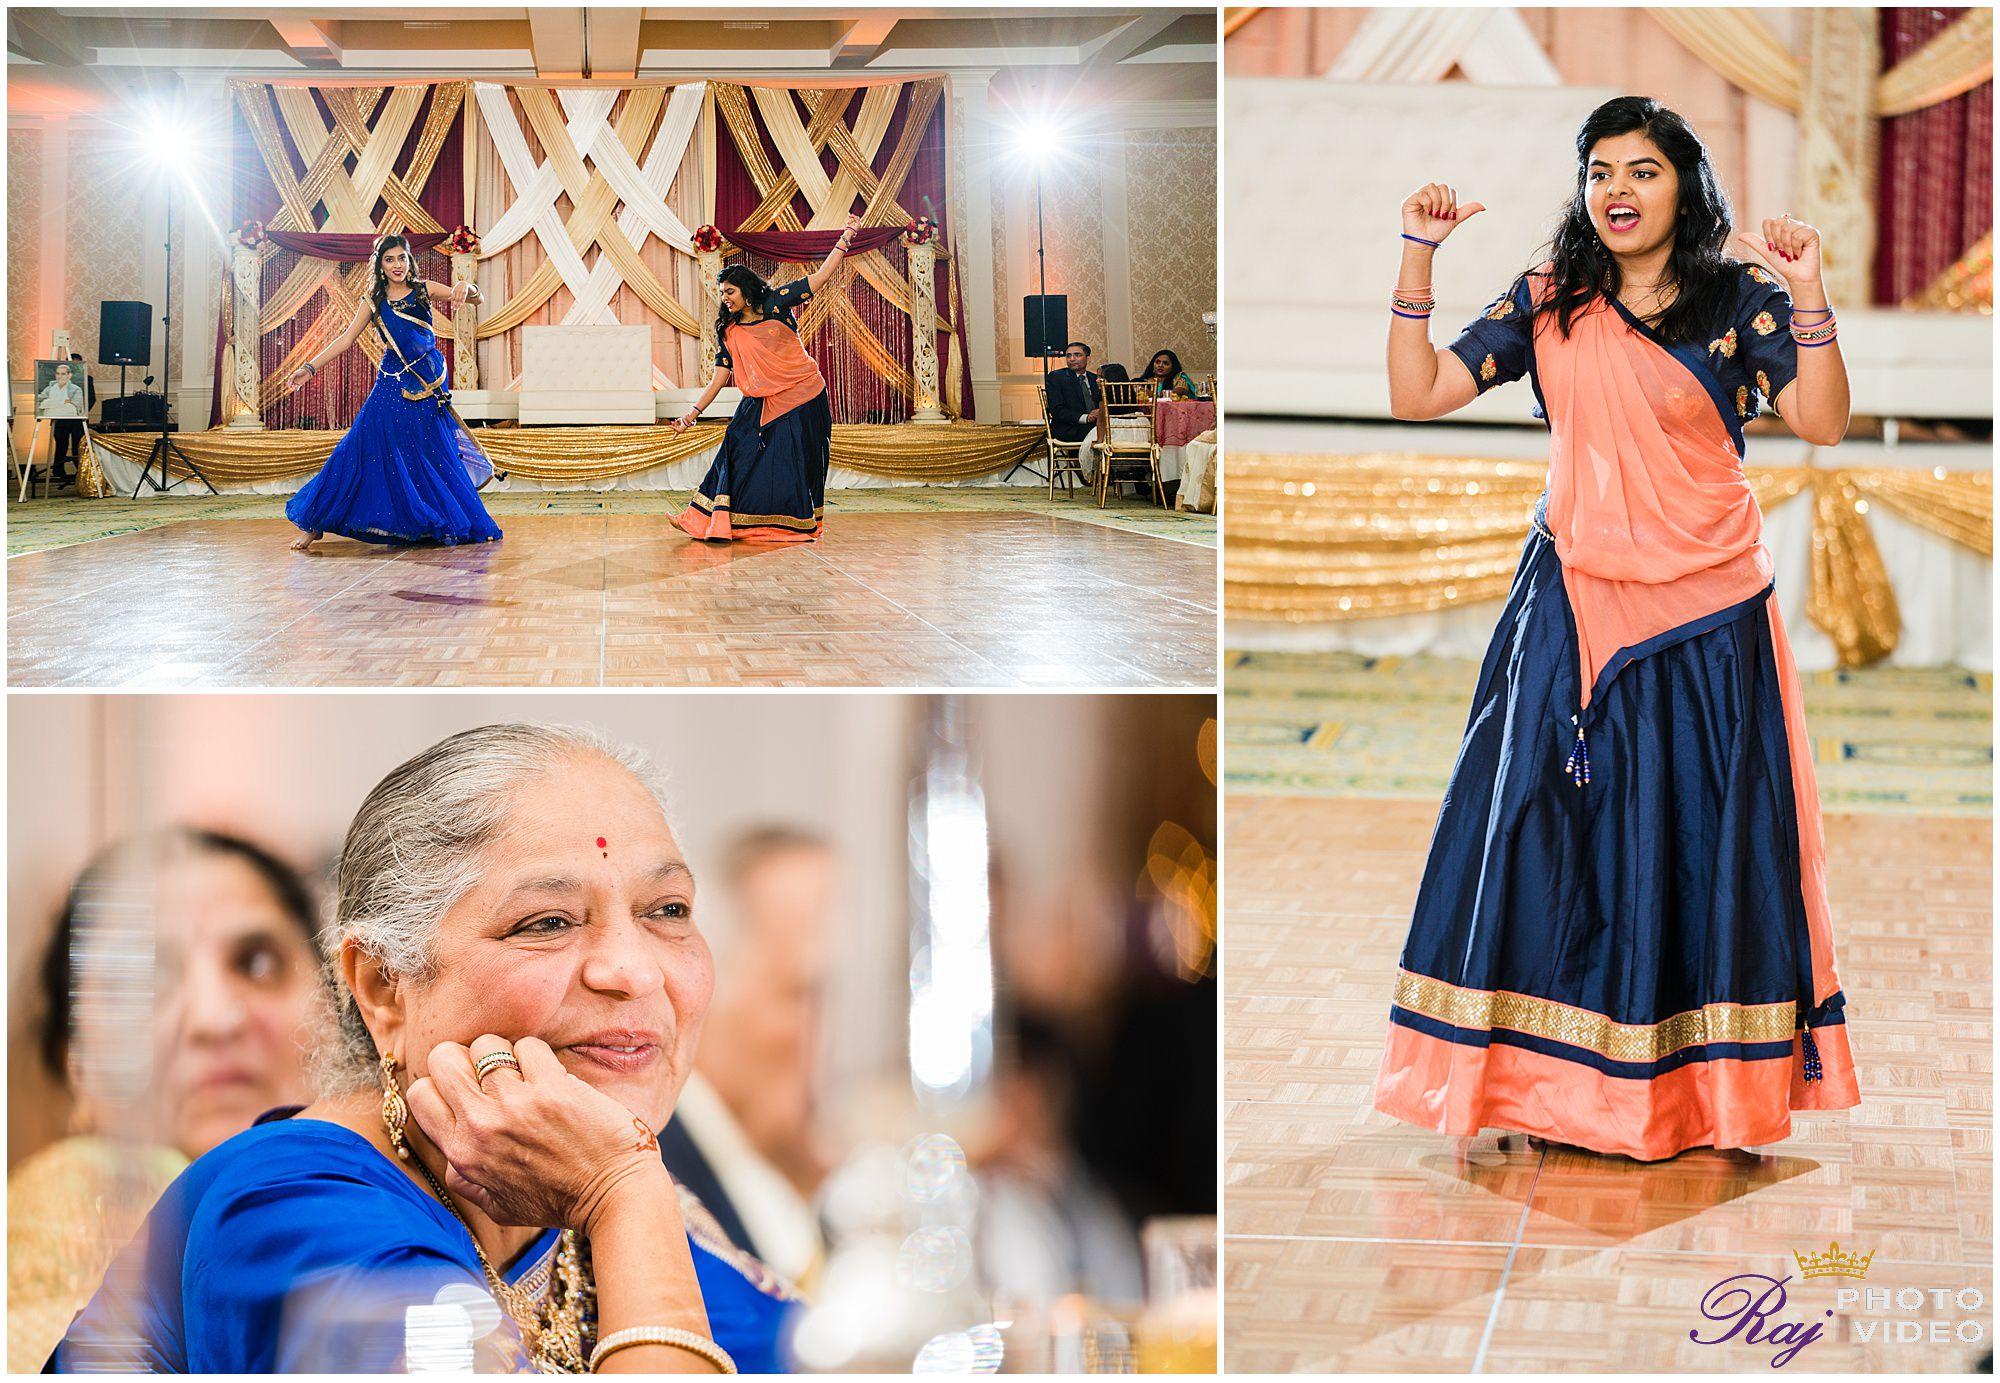 Founders-Inn-and-Spa-Virginia-Beach-VA-Indian-Wedding-Harini-Vivek-78.jpg